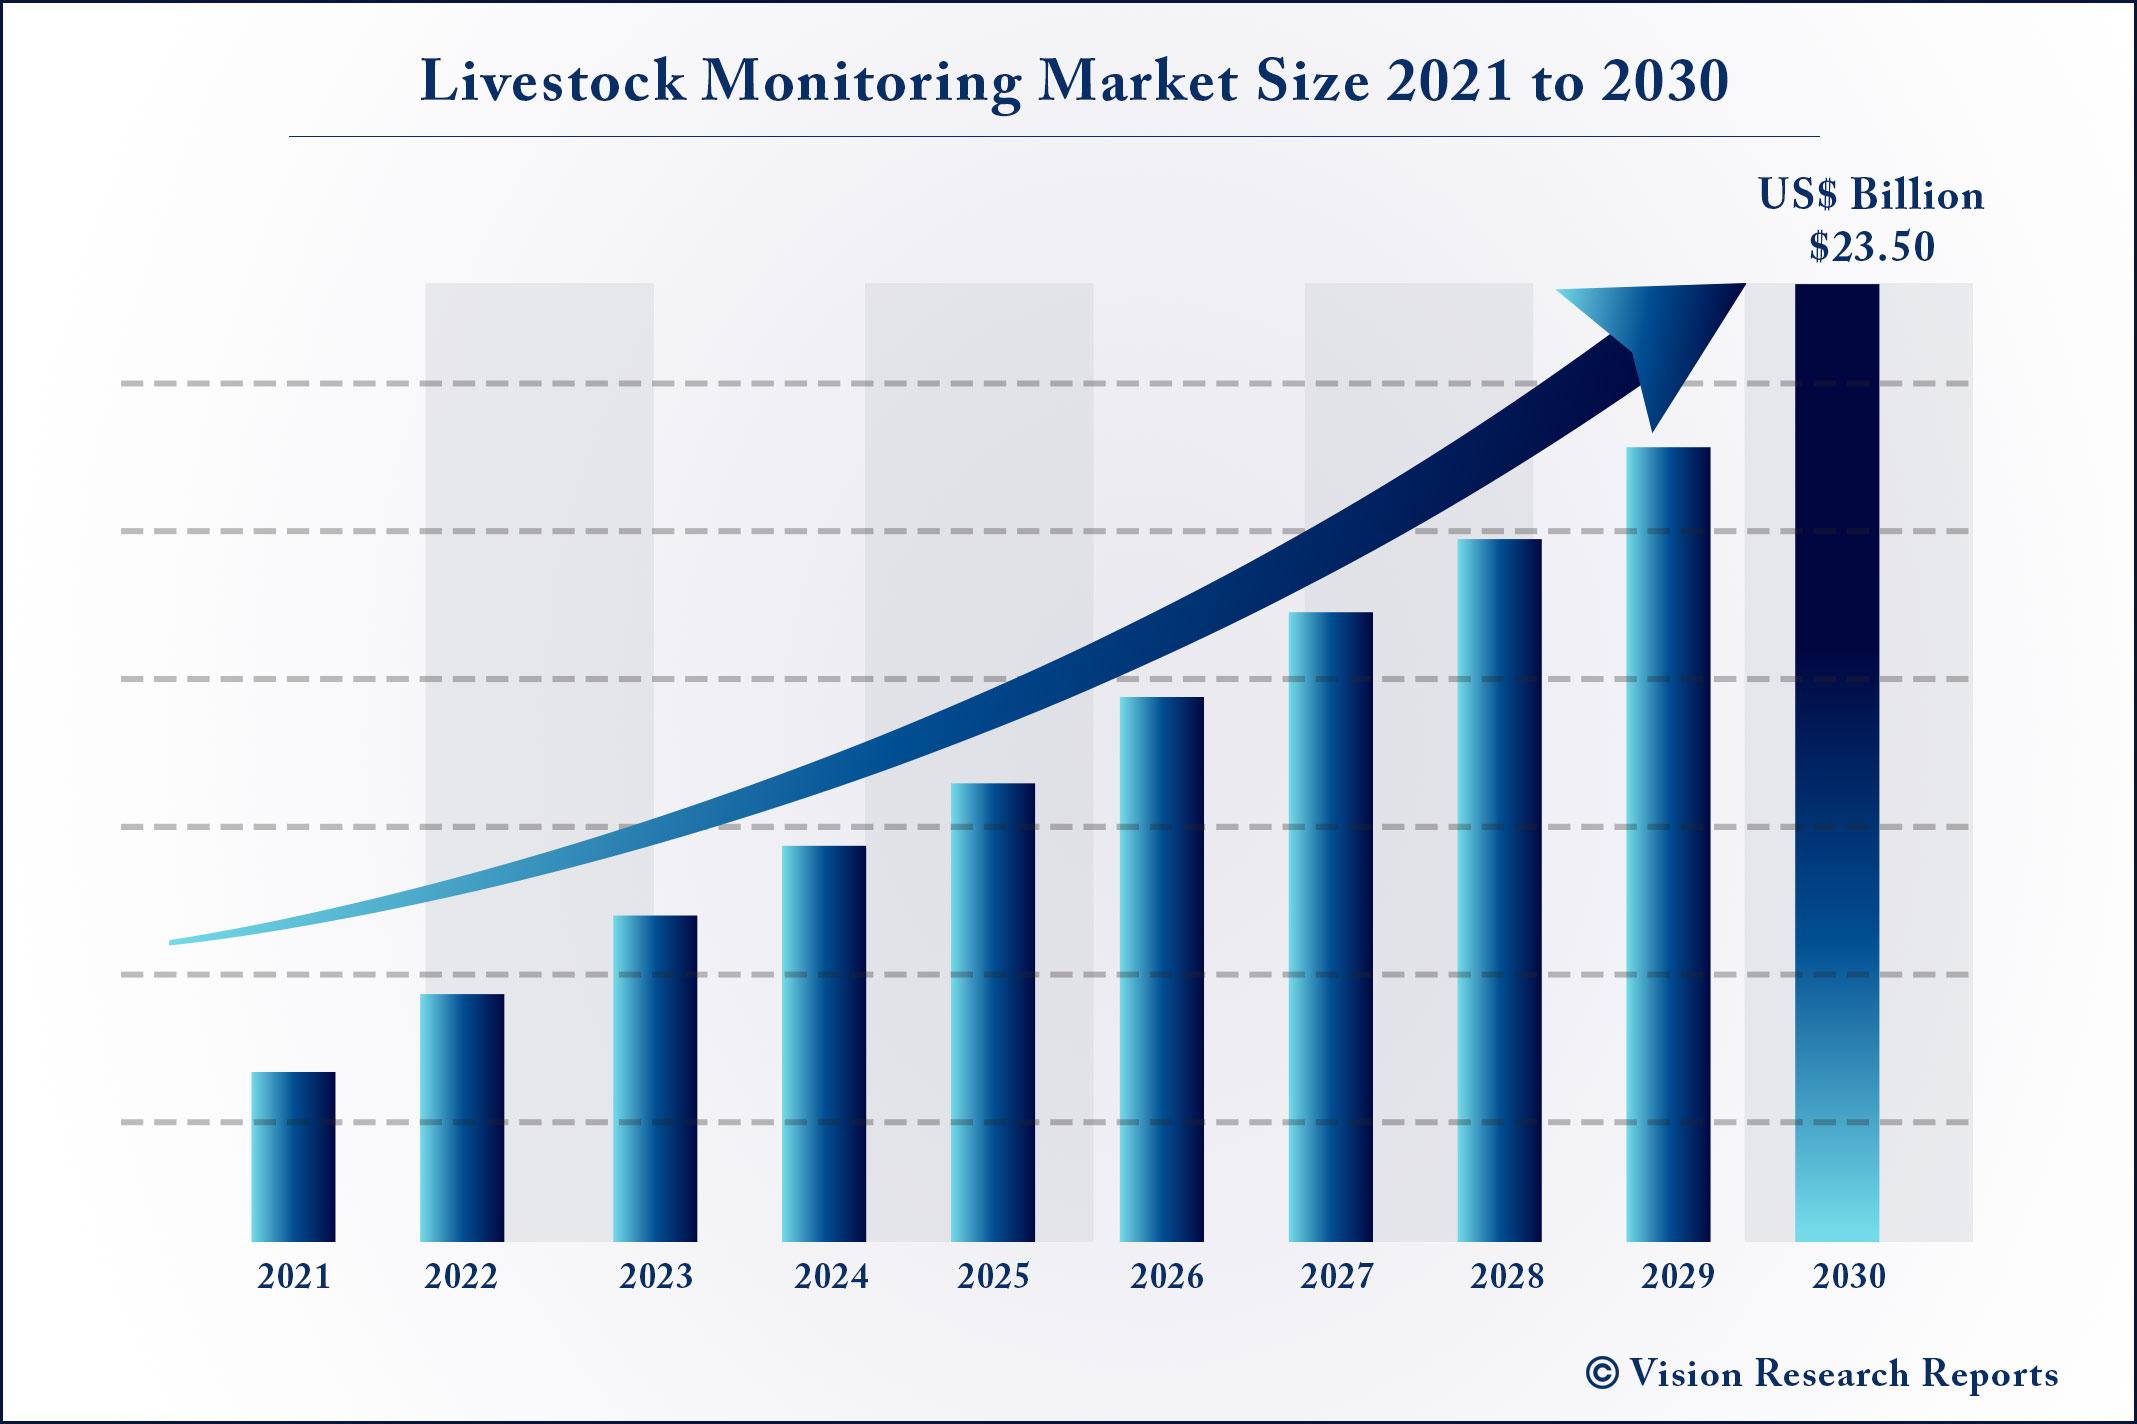 Livestock Monitoring Market Size 2021 to 2030